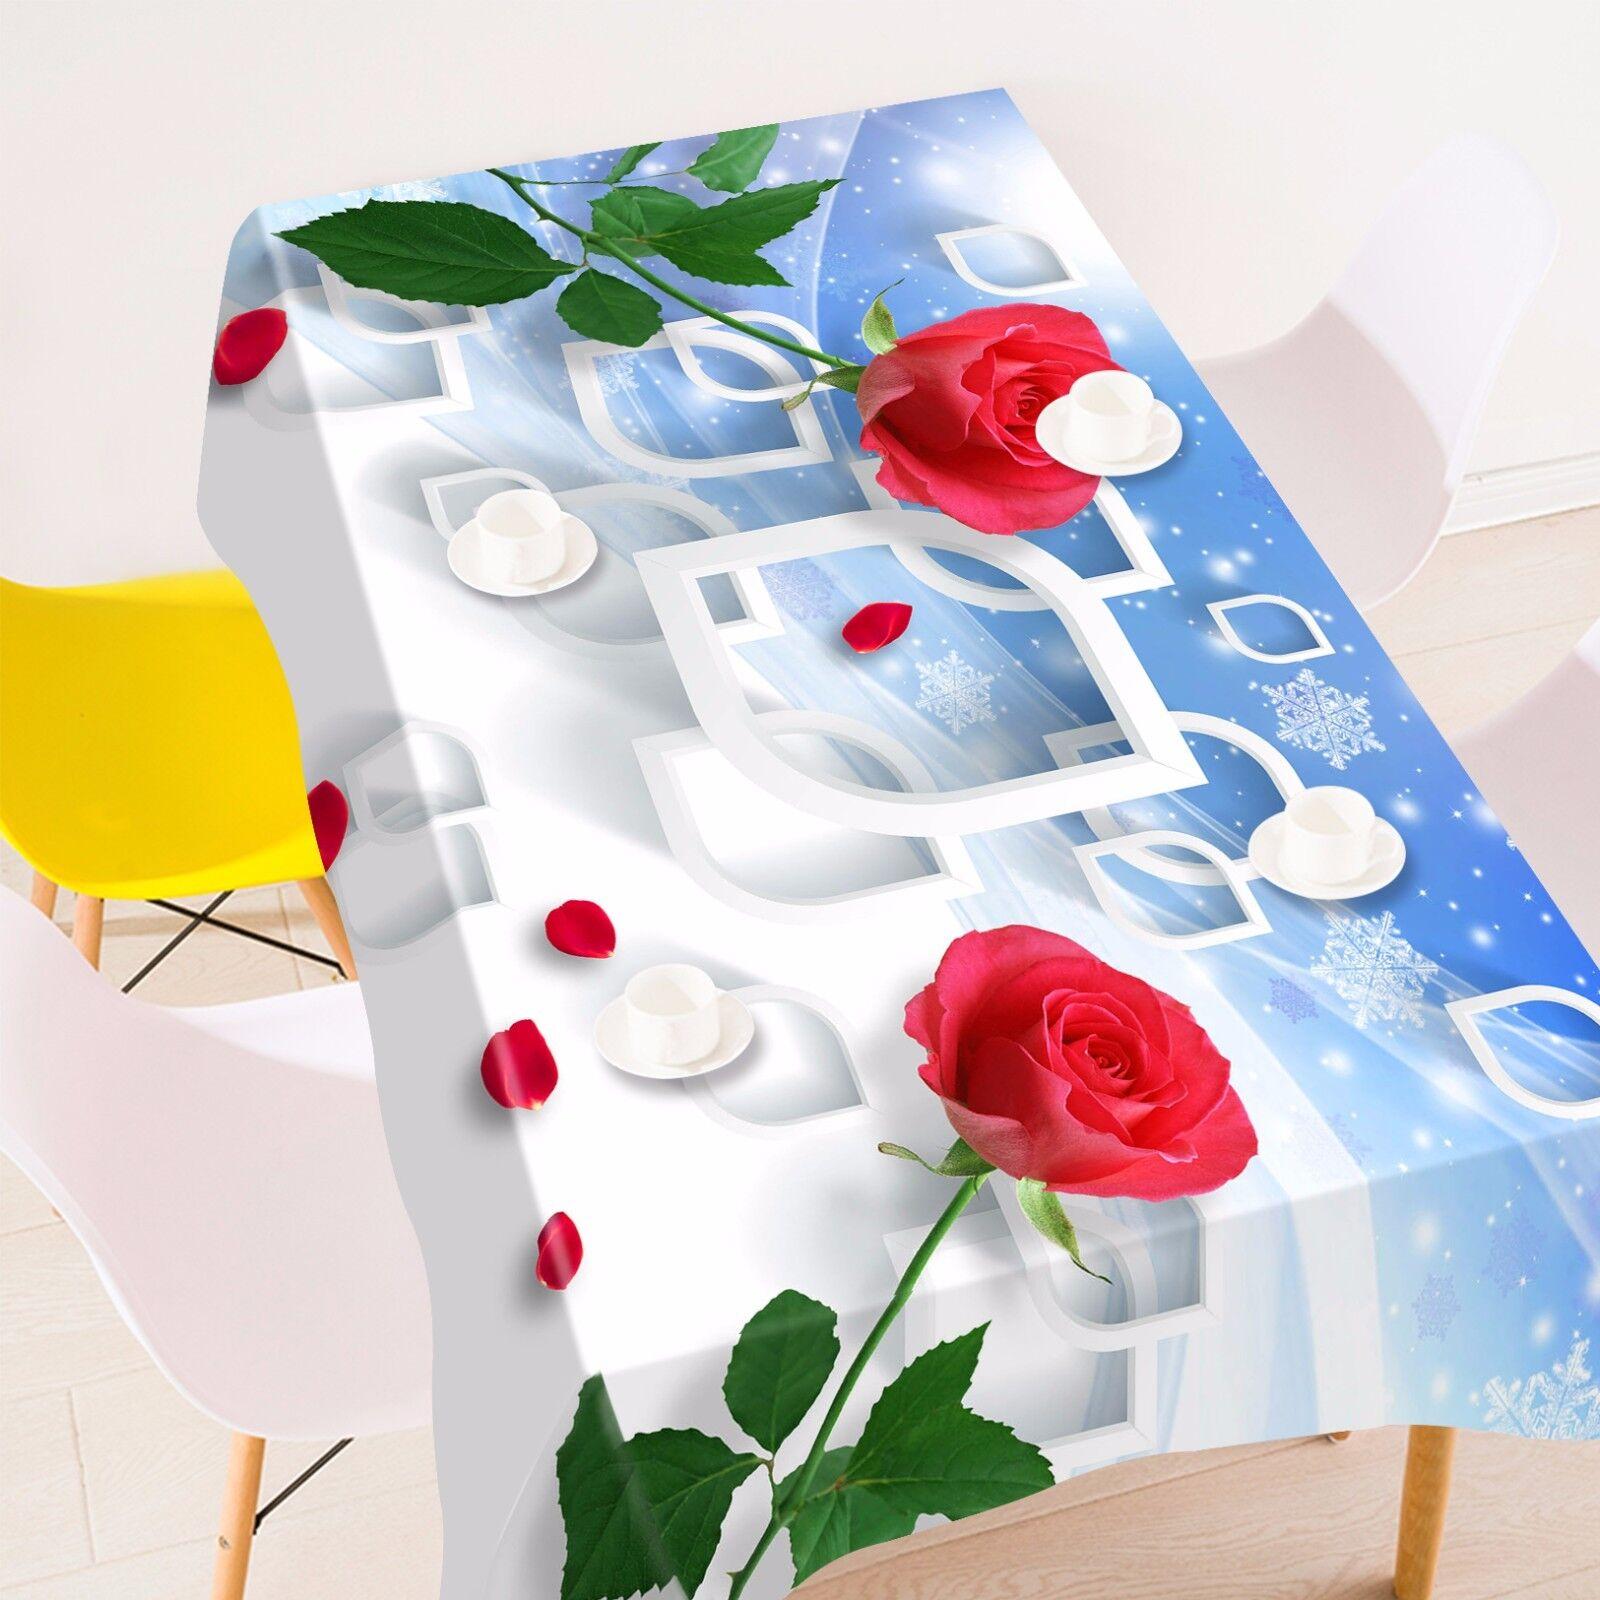 3D Petals 52 Tablecloth Table Cover Cloth Birthday Party AJ WALLPAPER UK Lemon